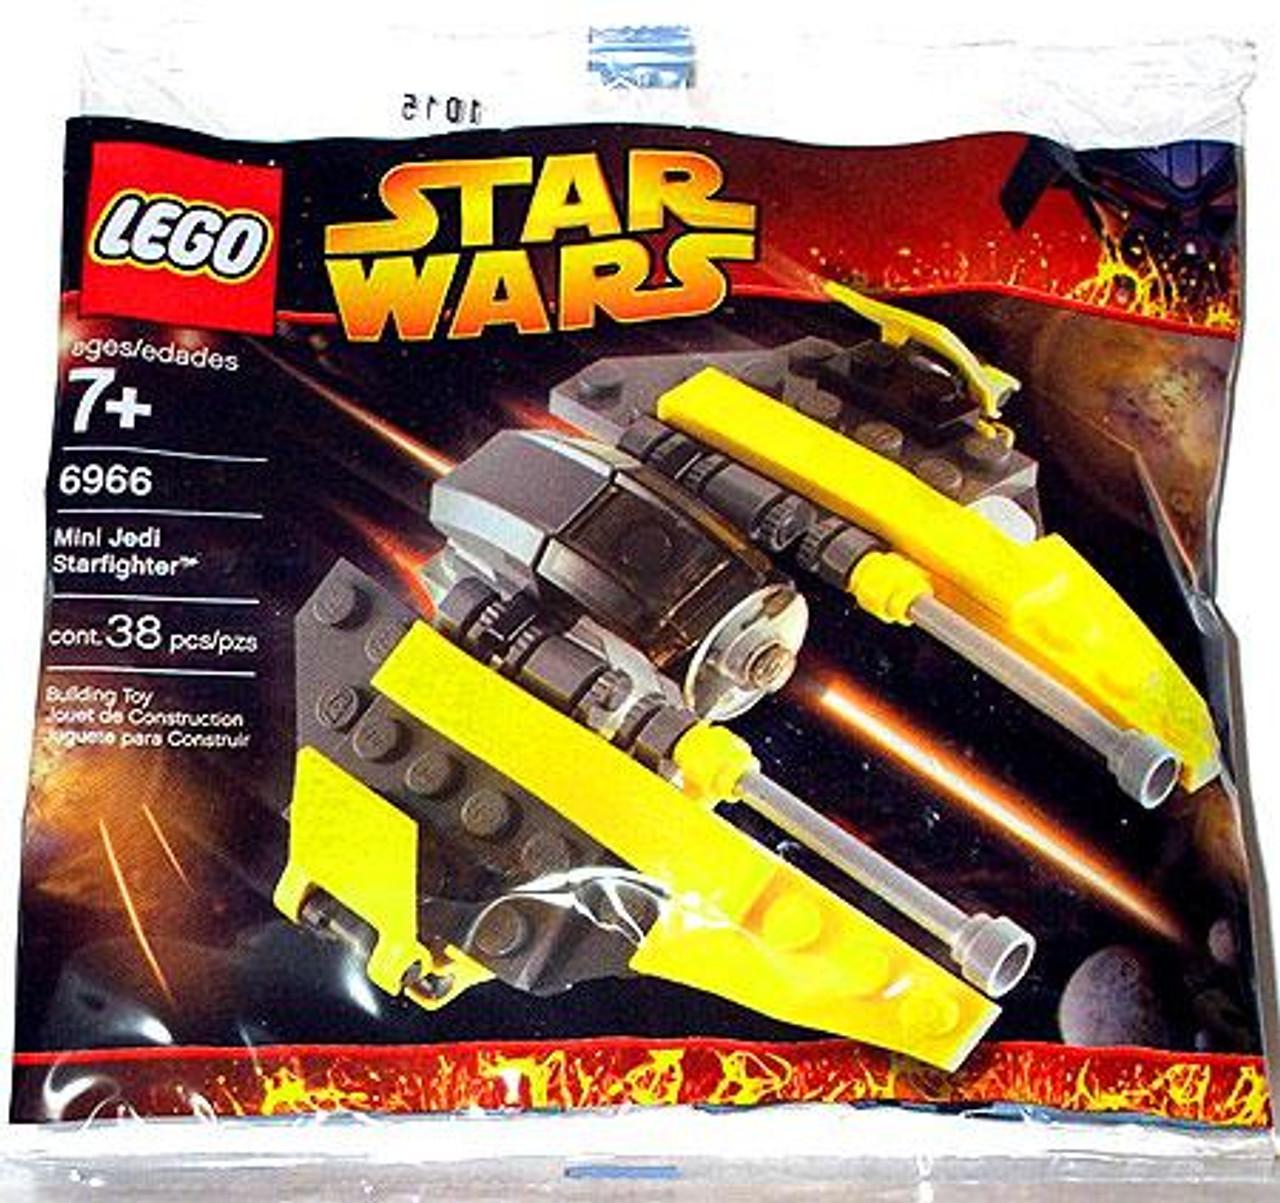 LEGO Star Wars Revenge of the Sith Jedi Starfighter Mini Set #6966 [Bagged]